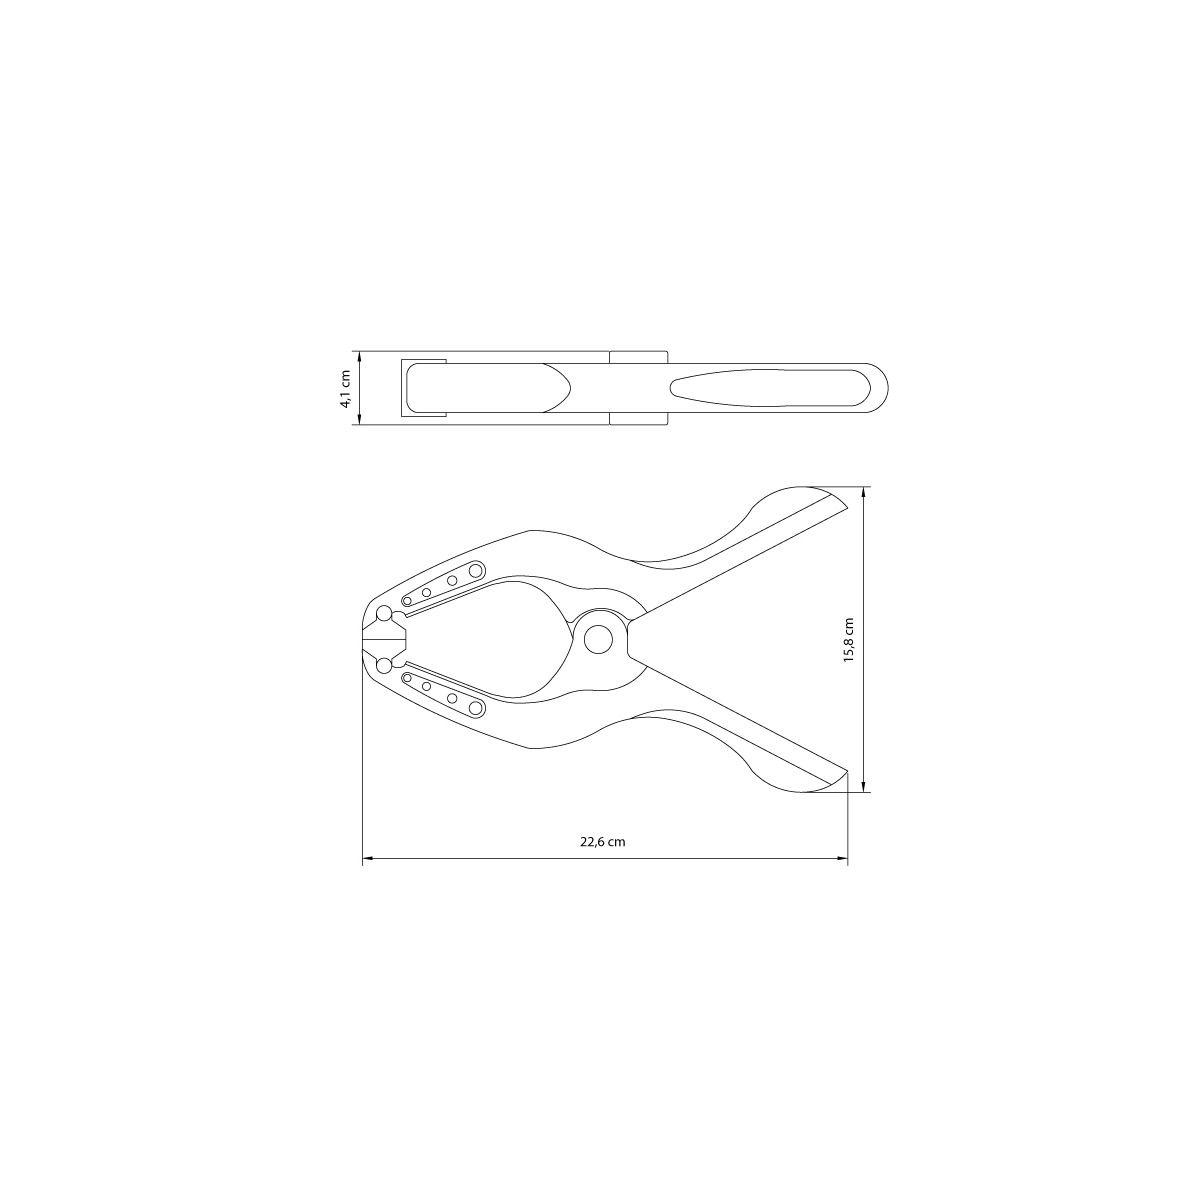 Grampo Prendedor Tramontina Nº 3 / 210mm - Kit com 2 Unidades